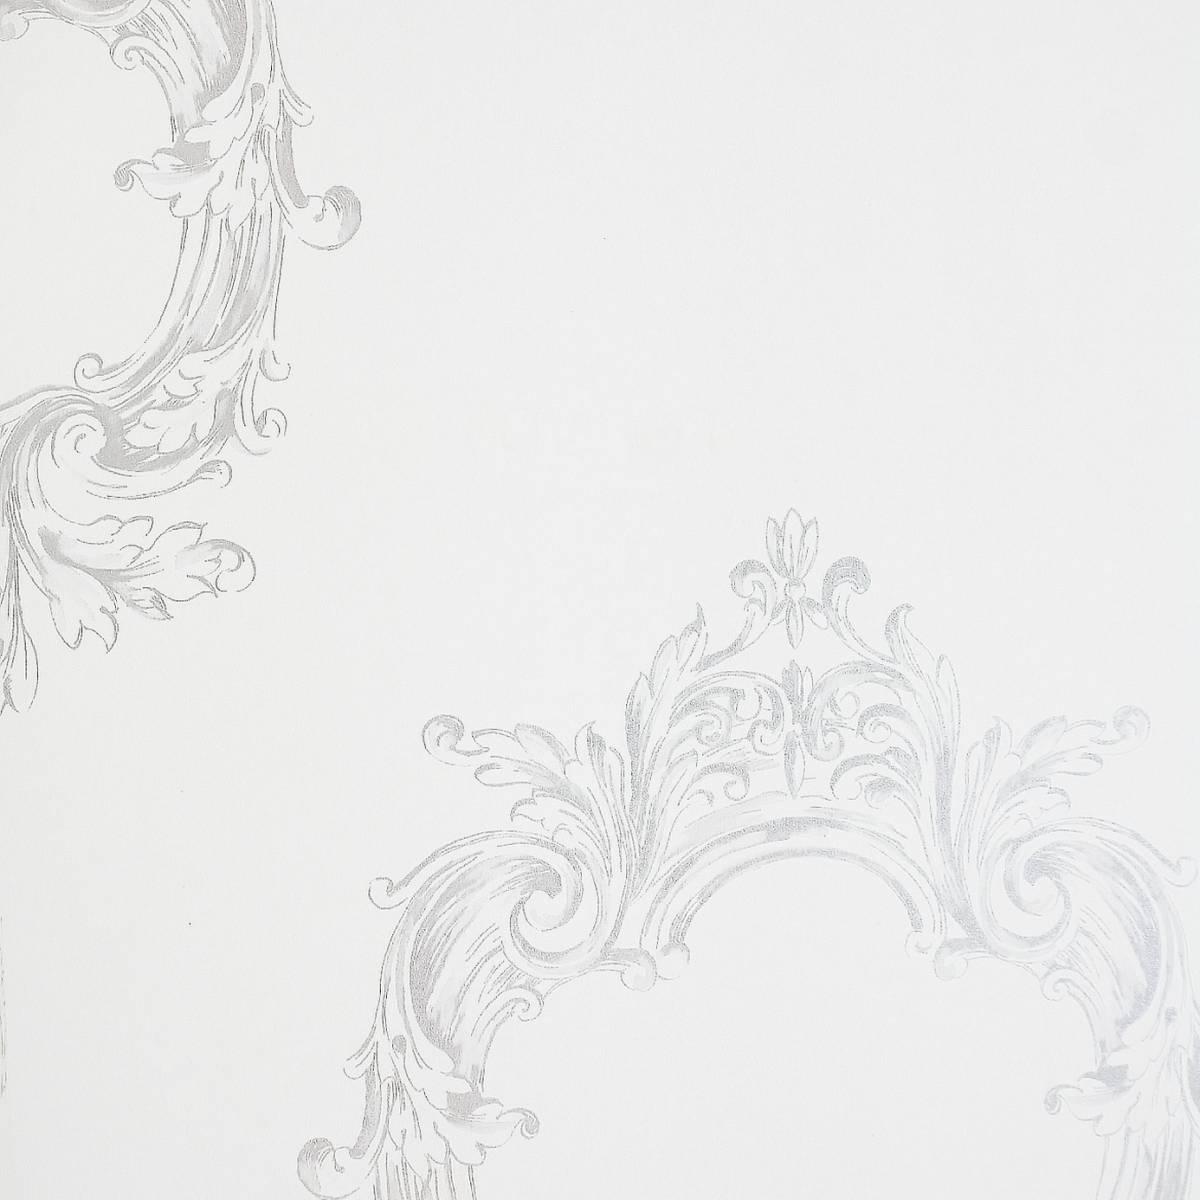 Miroir wallpaper white 63469000 caselio legends for Miroir wallpaper